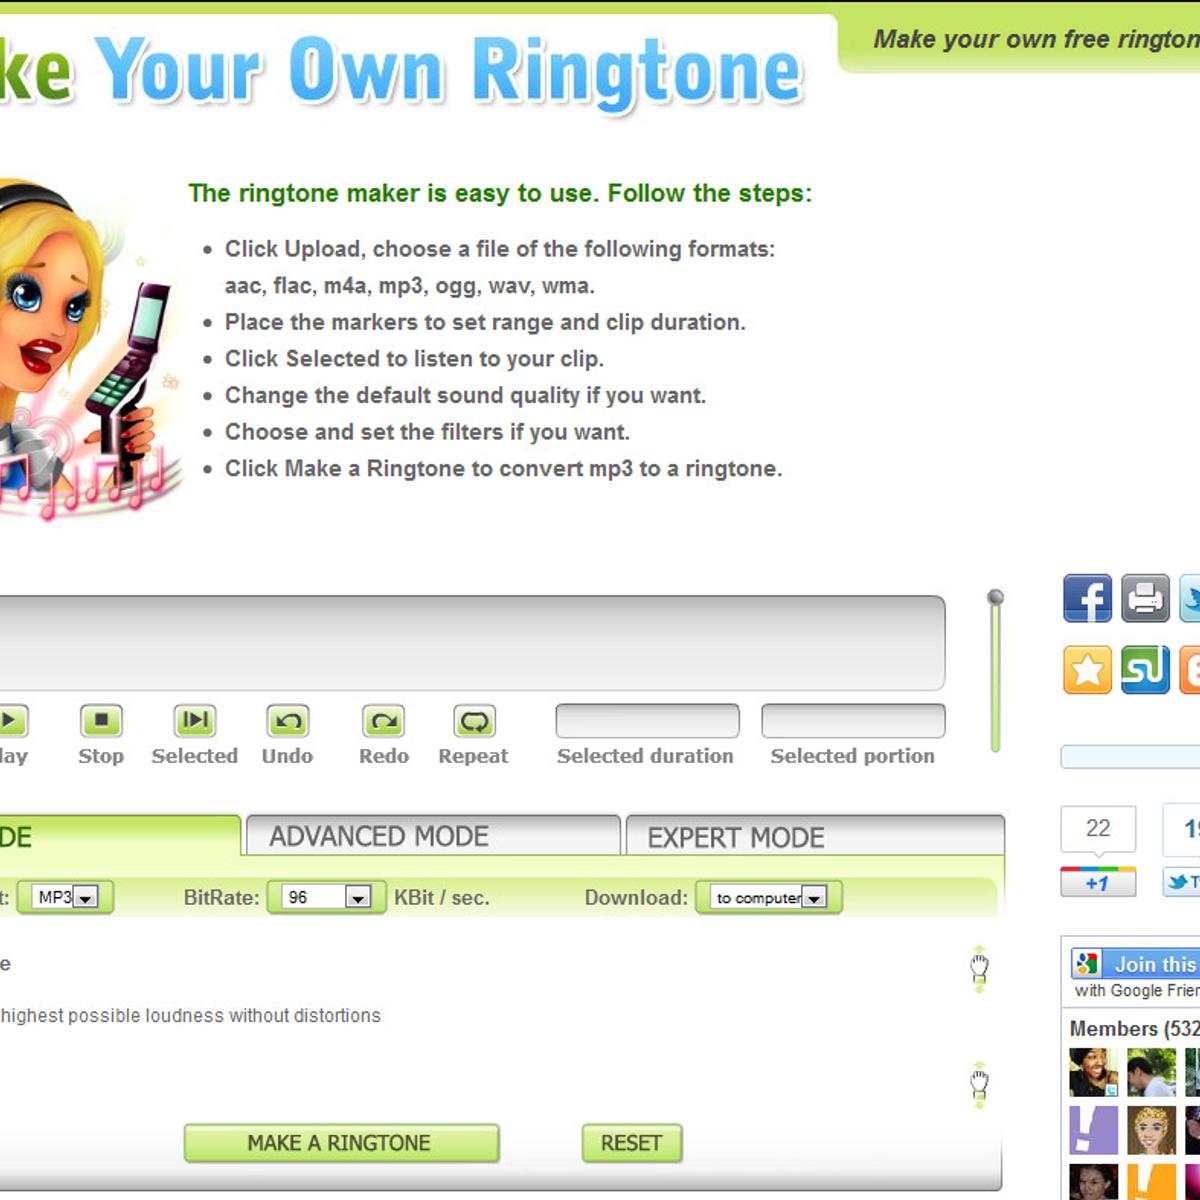 MakeOwnRingtone com Alternatives and Similar Websites and